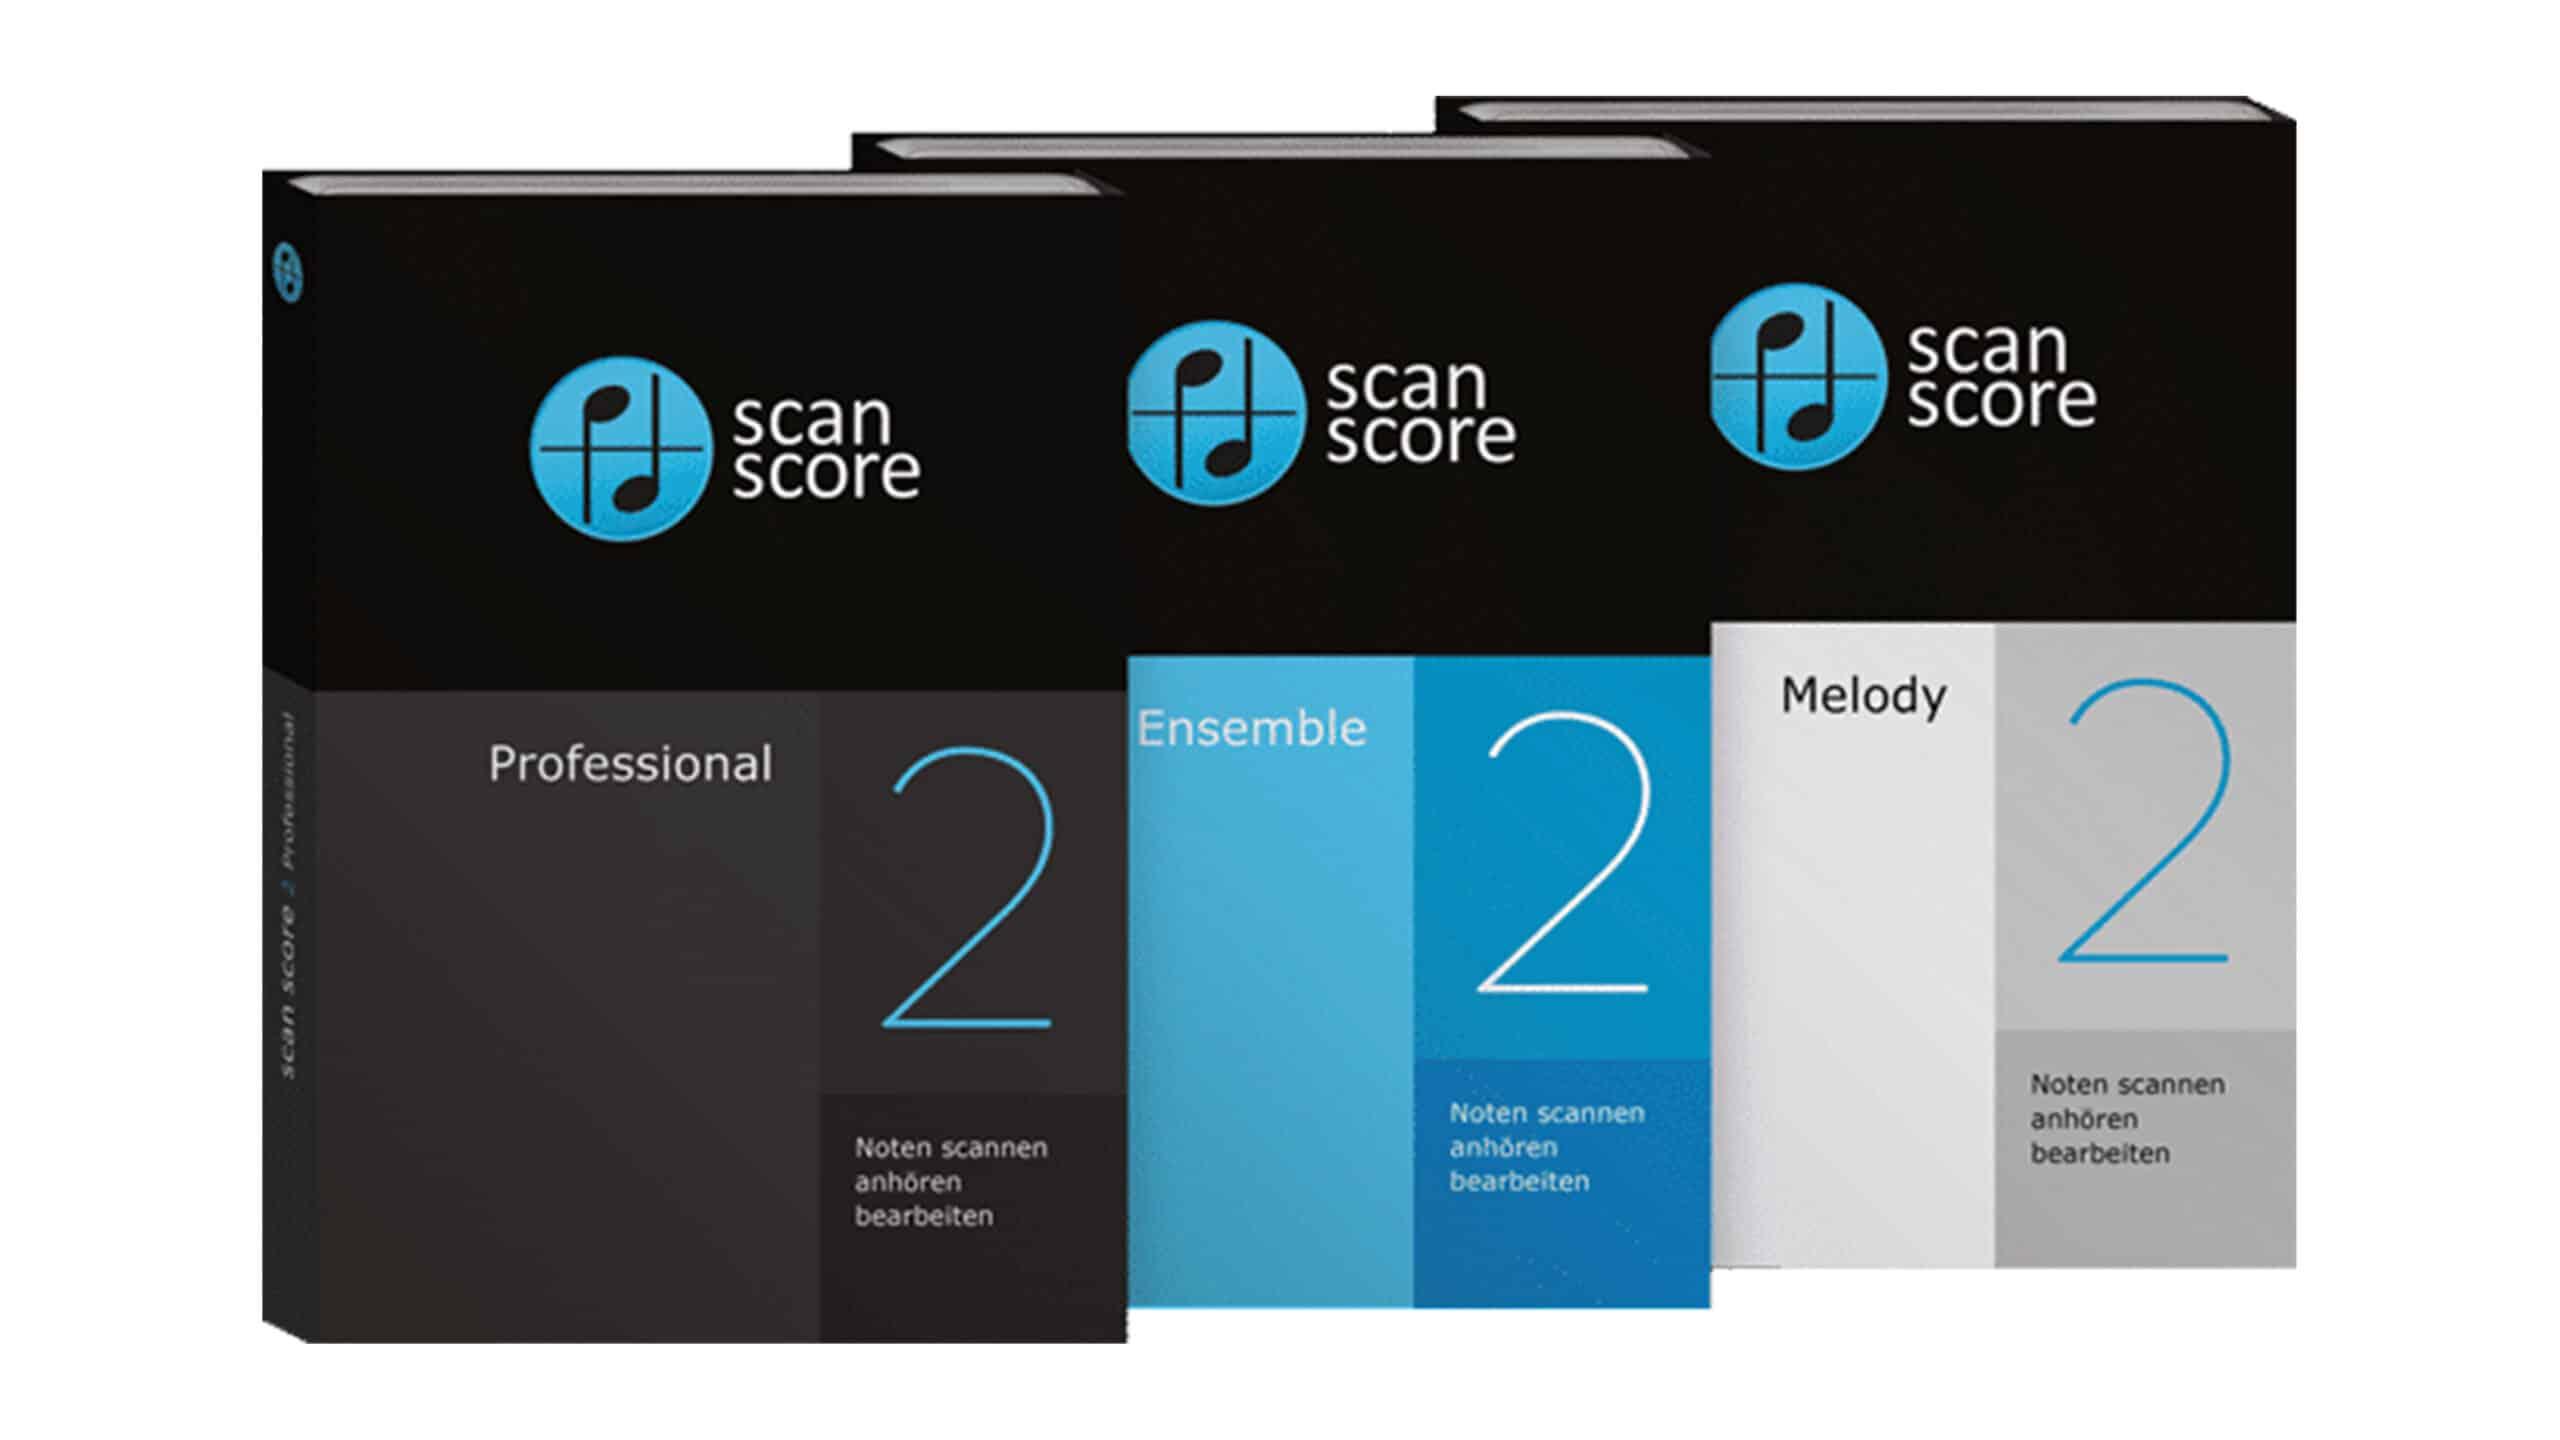 ScanScore version